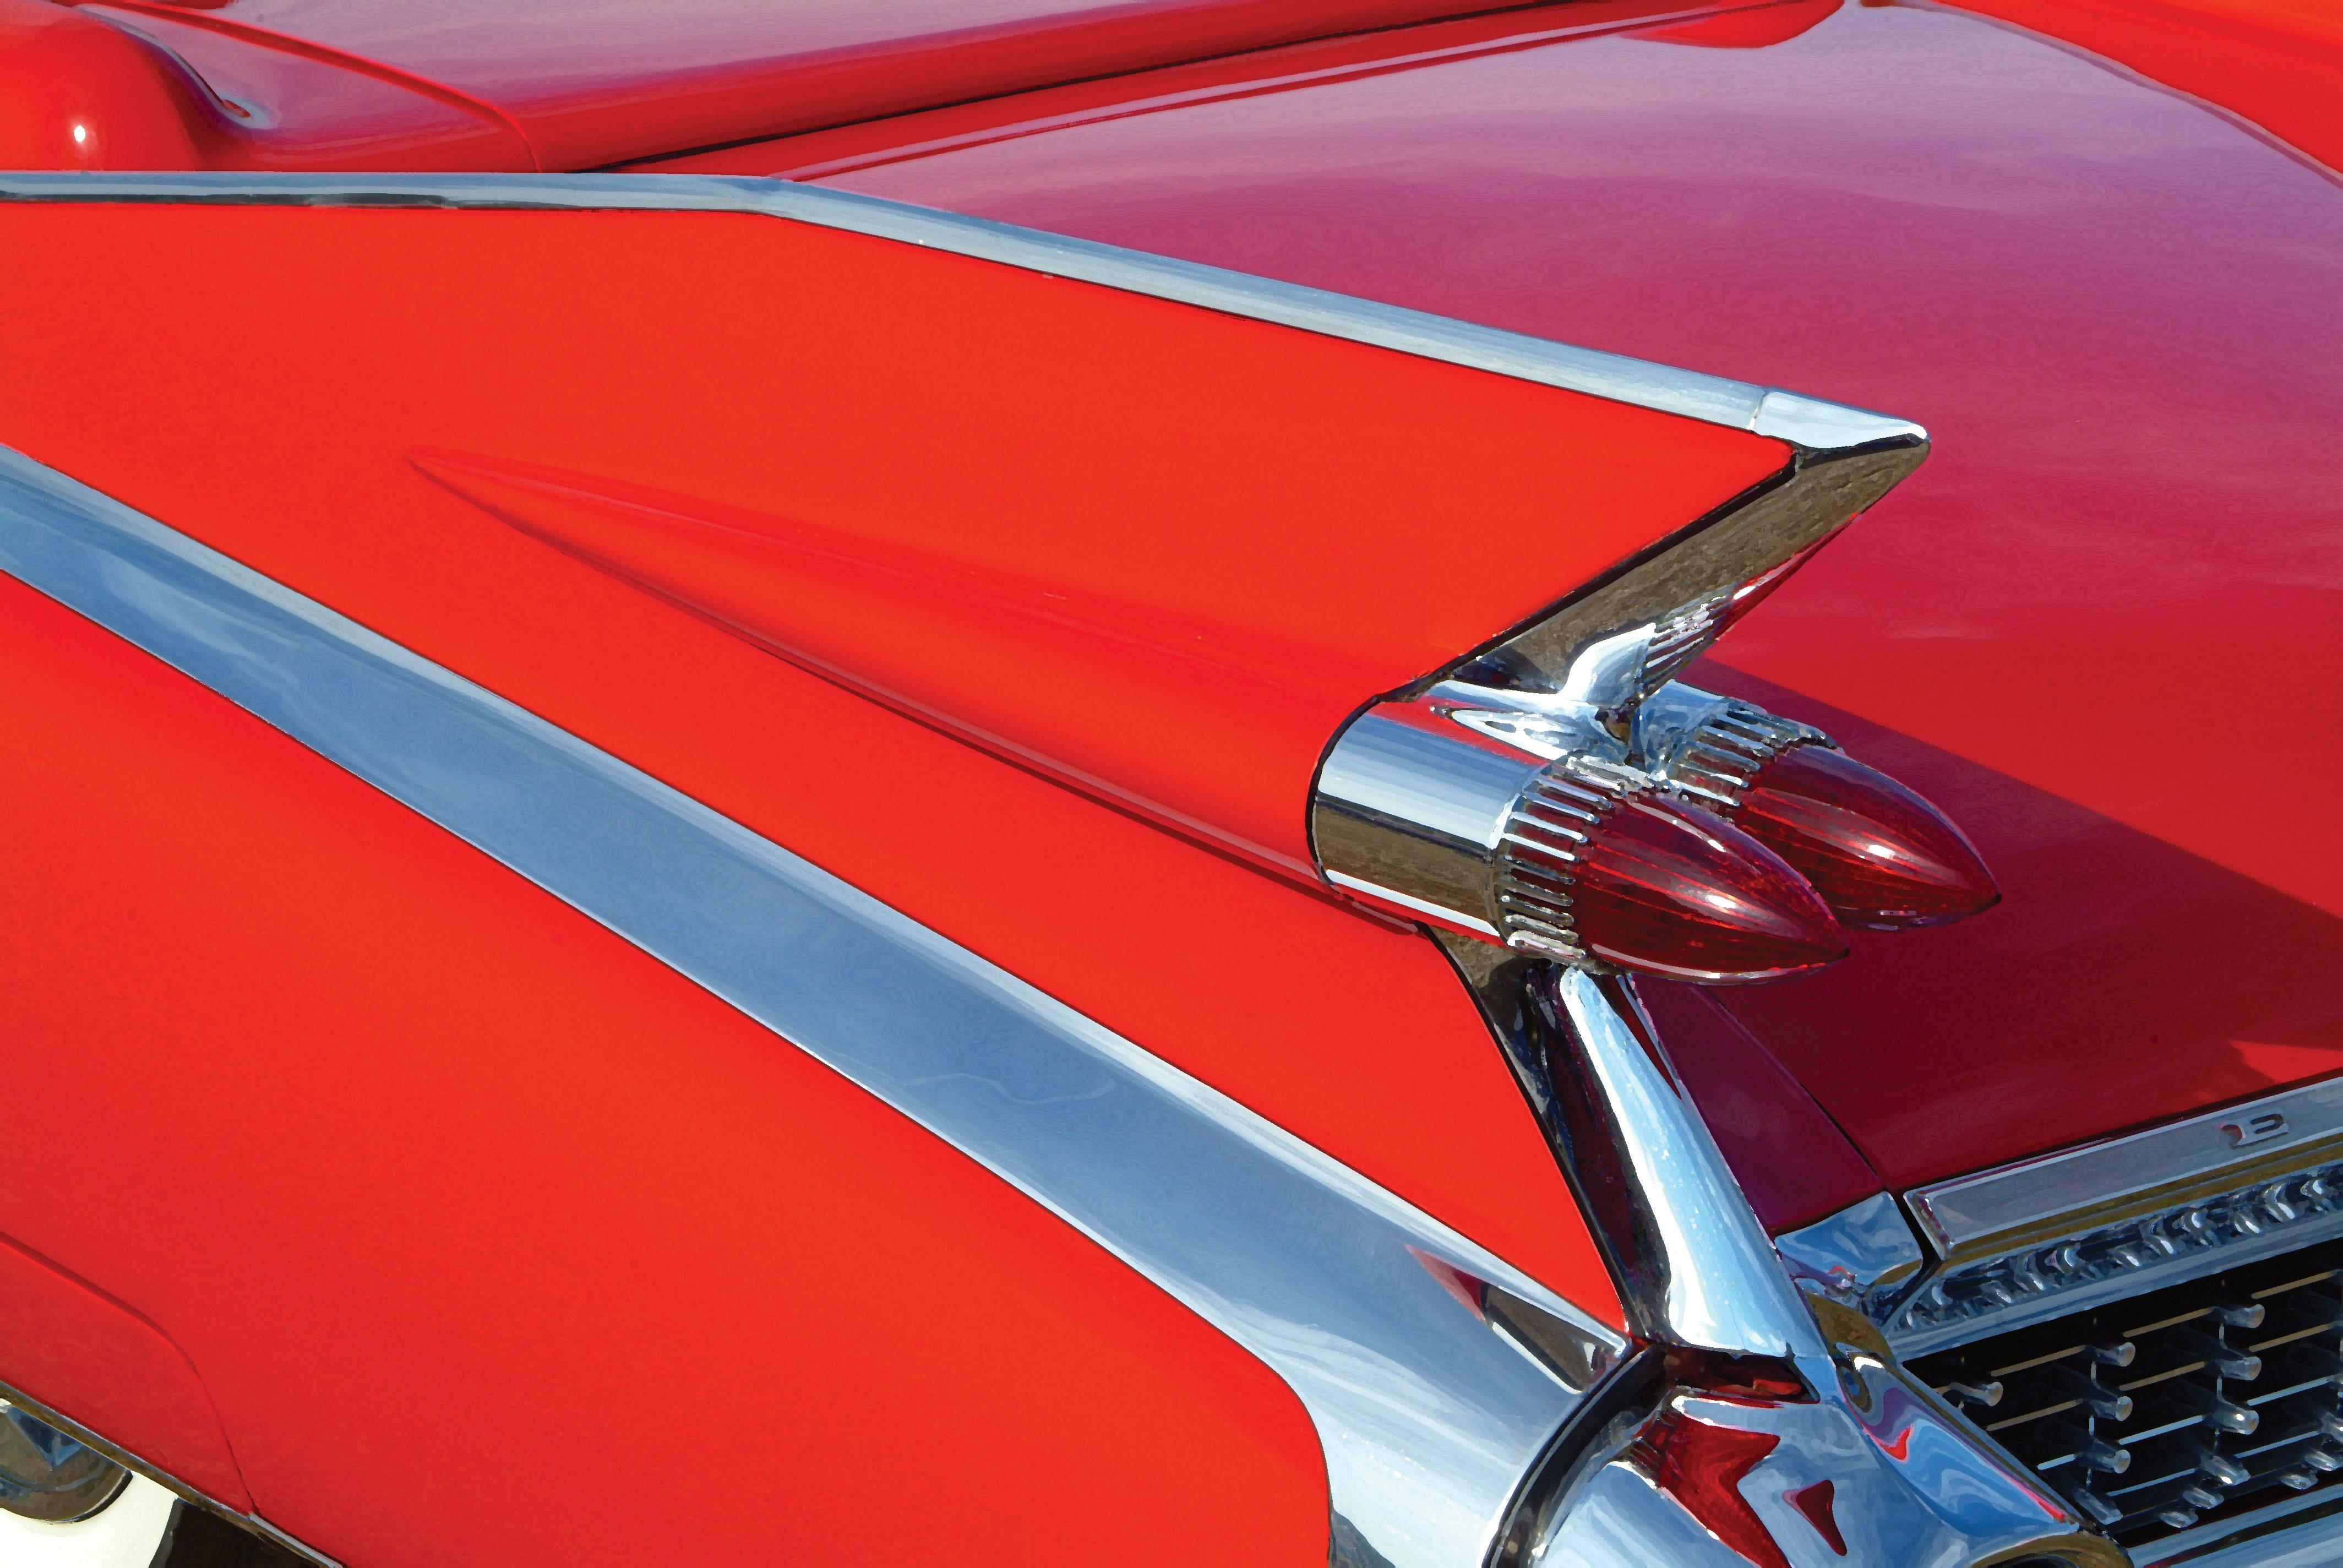 1959 Caddy Eldorado Tailfin